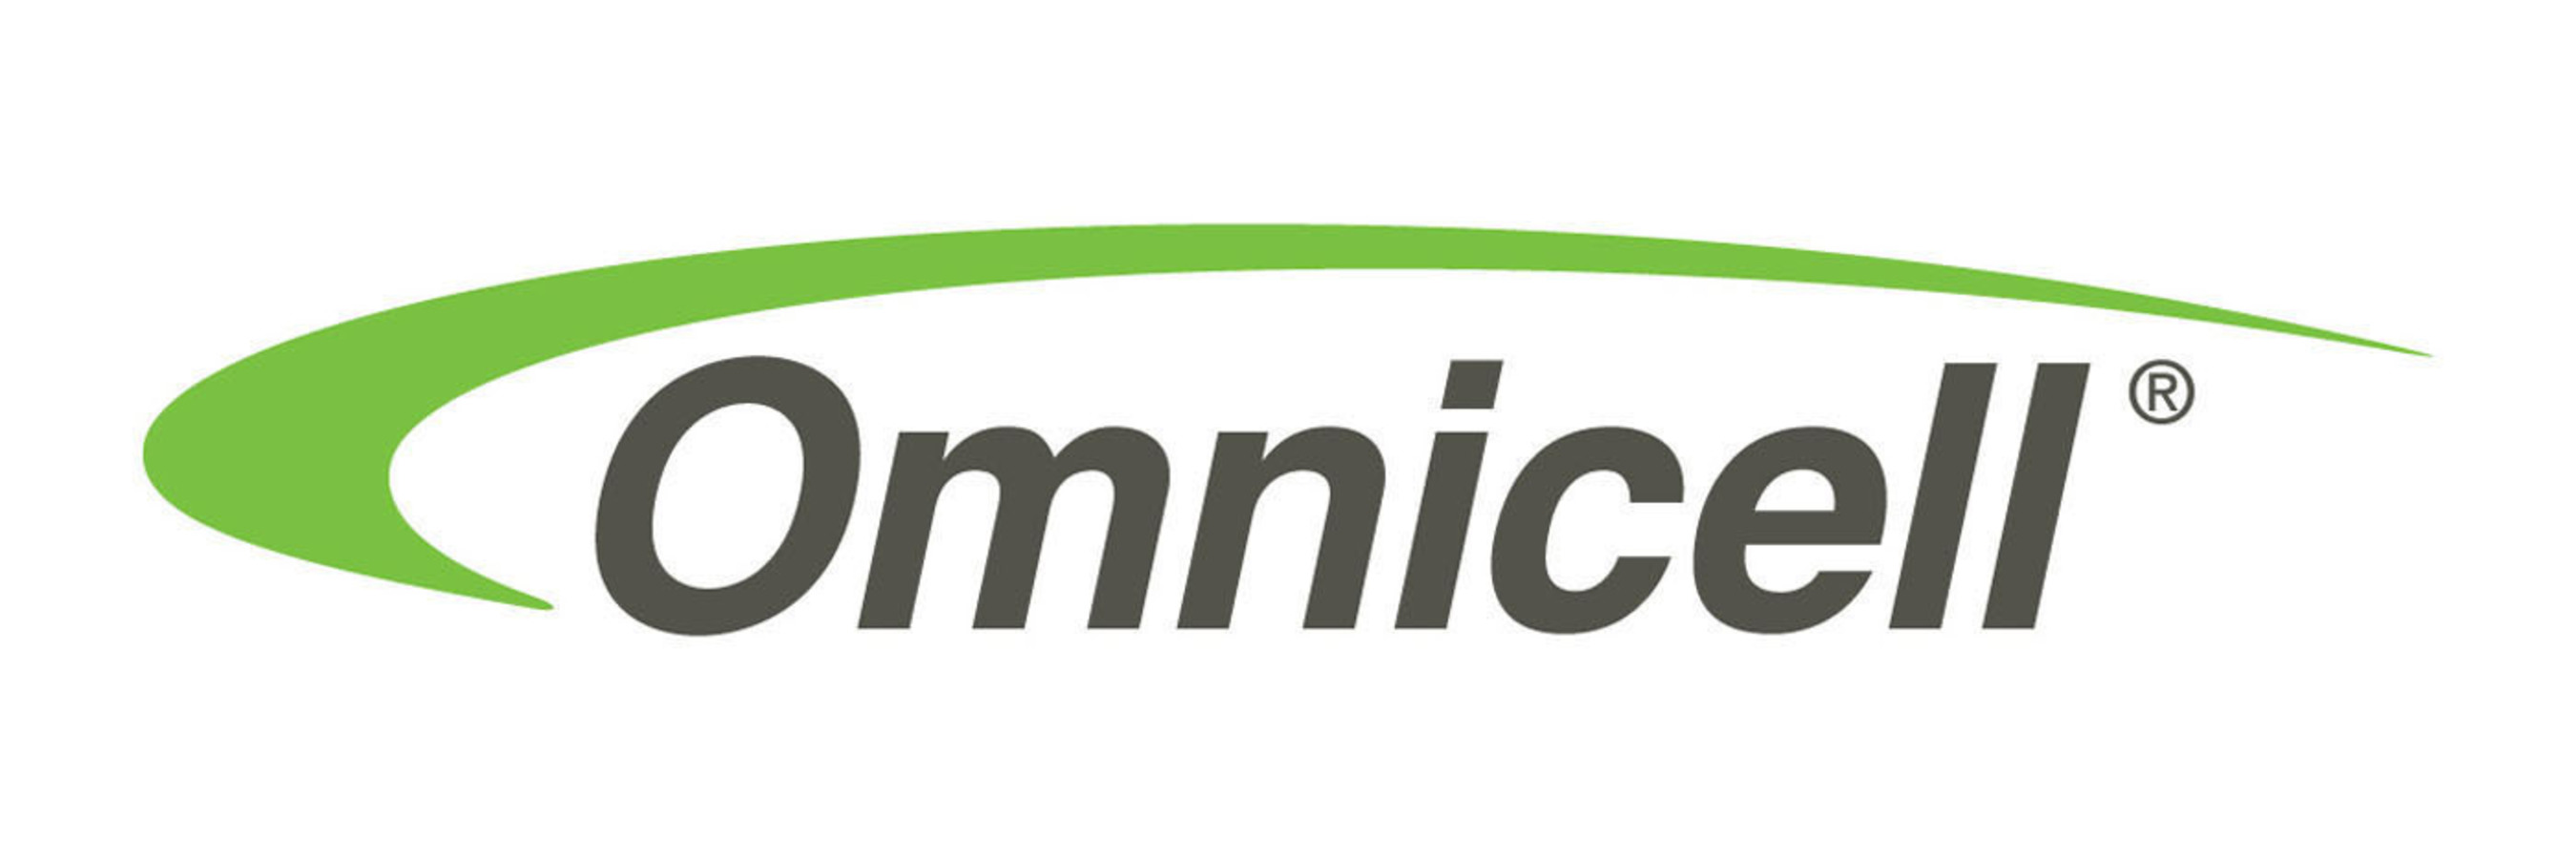 Omnicell, Inc. logo.